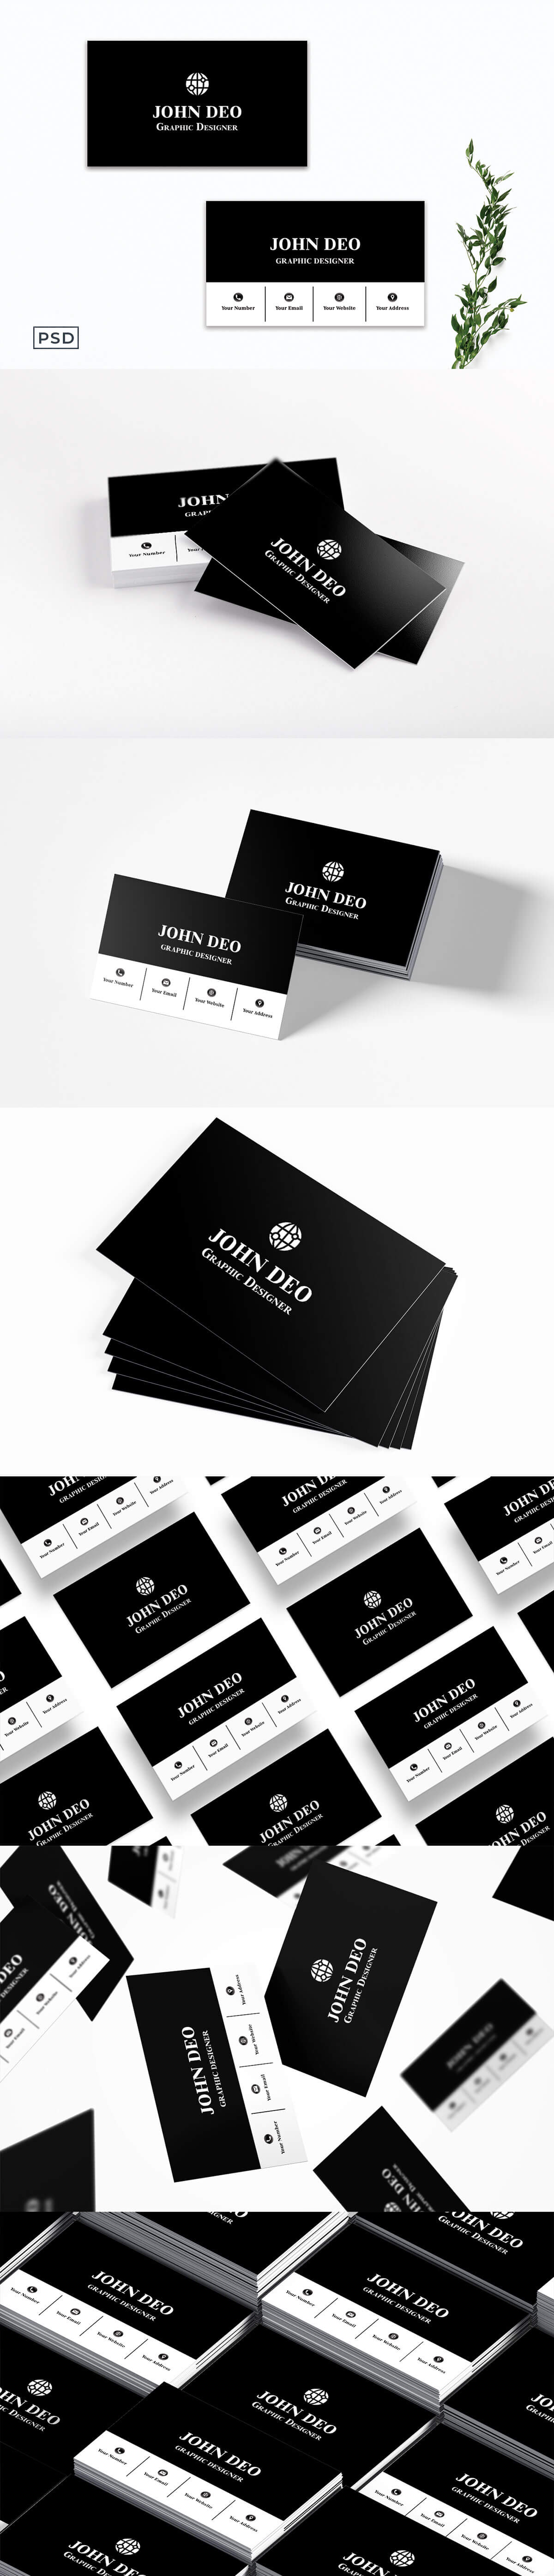 Free Black Innovative Business Card Template